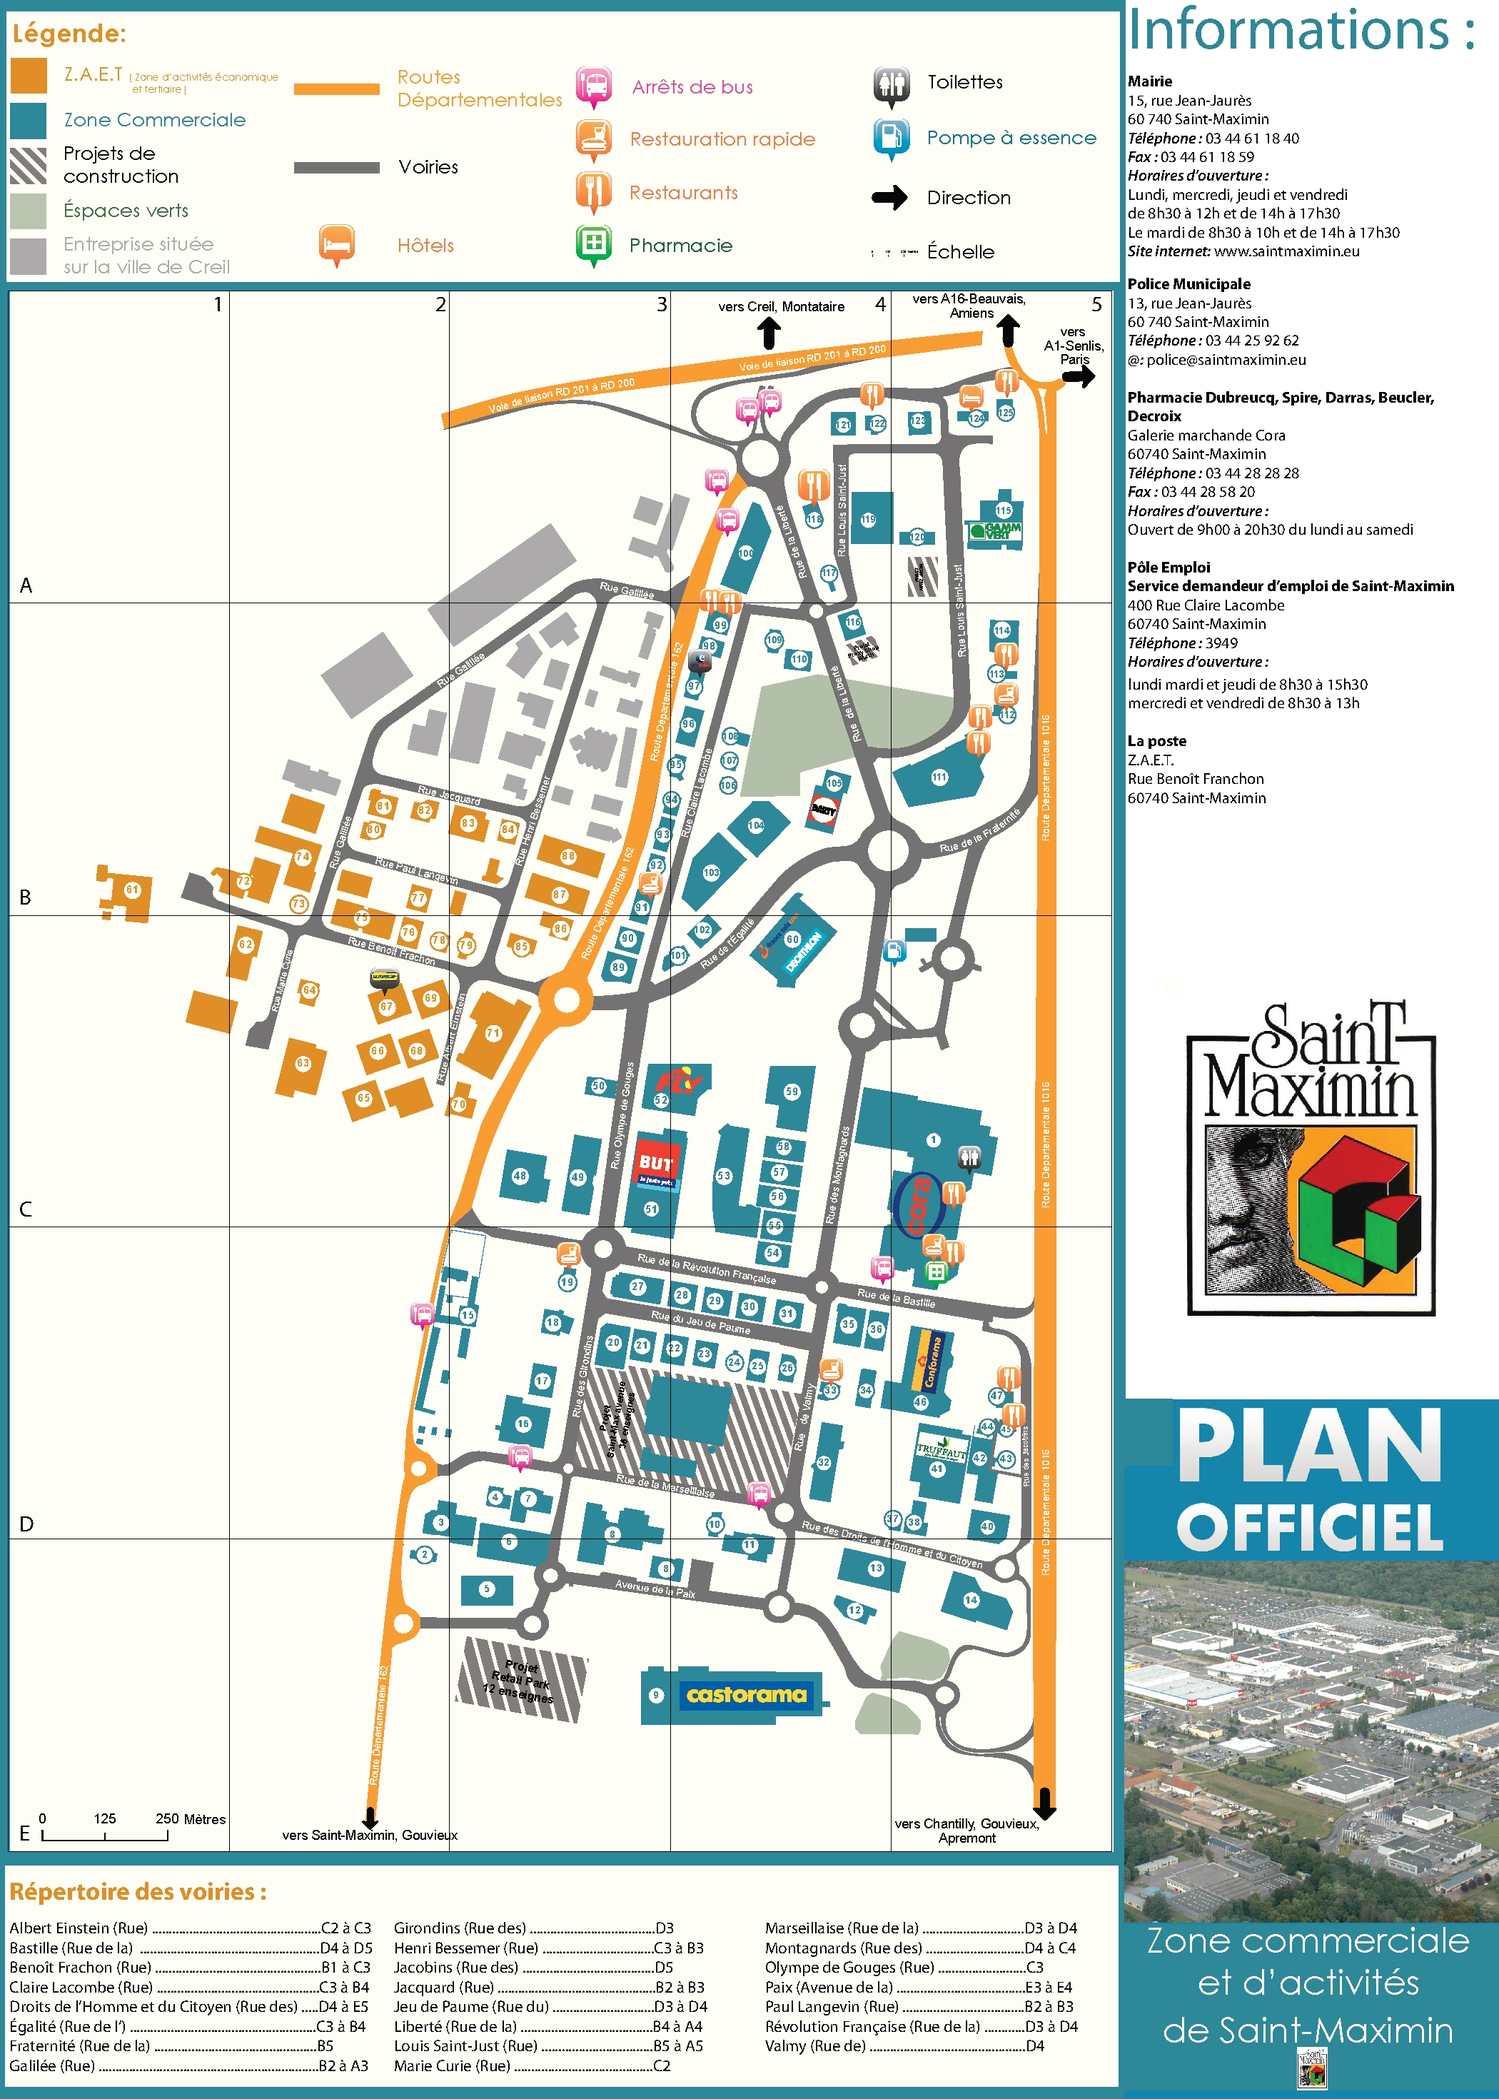 Verre Clair Saint Maximin calaméo - plan officiel de la zone commercial de saint-maximin